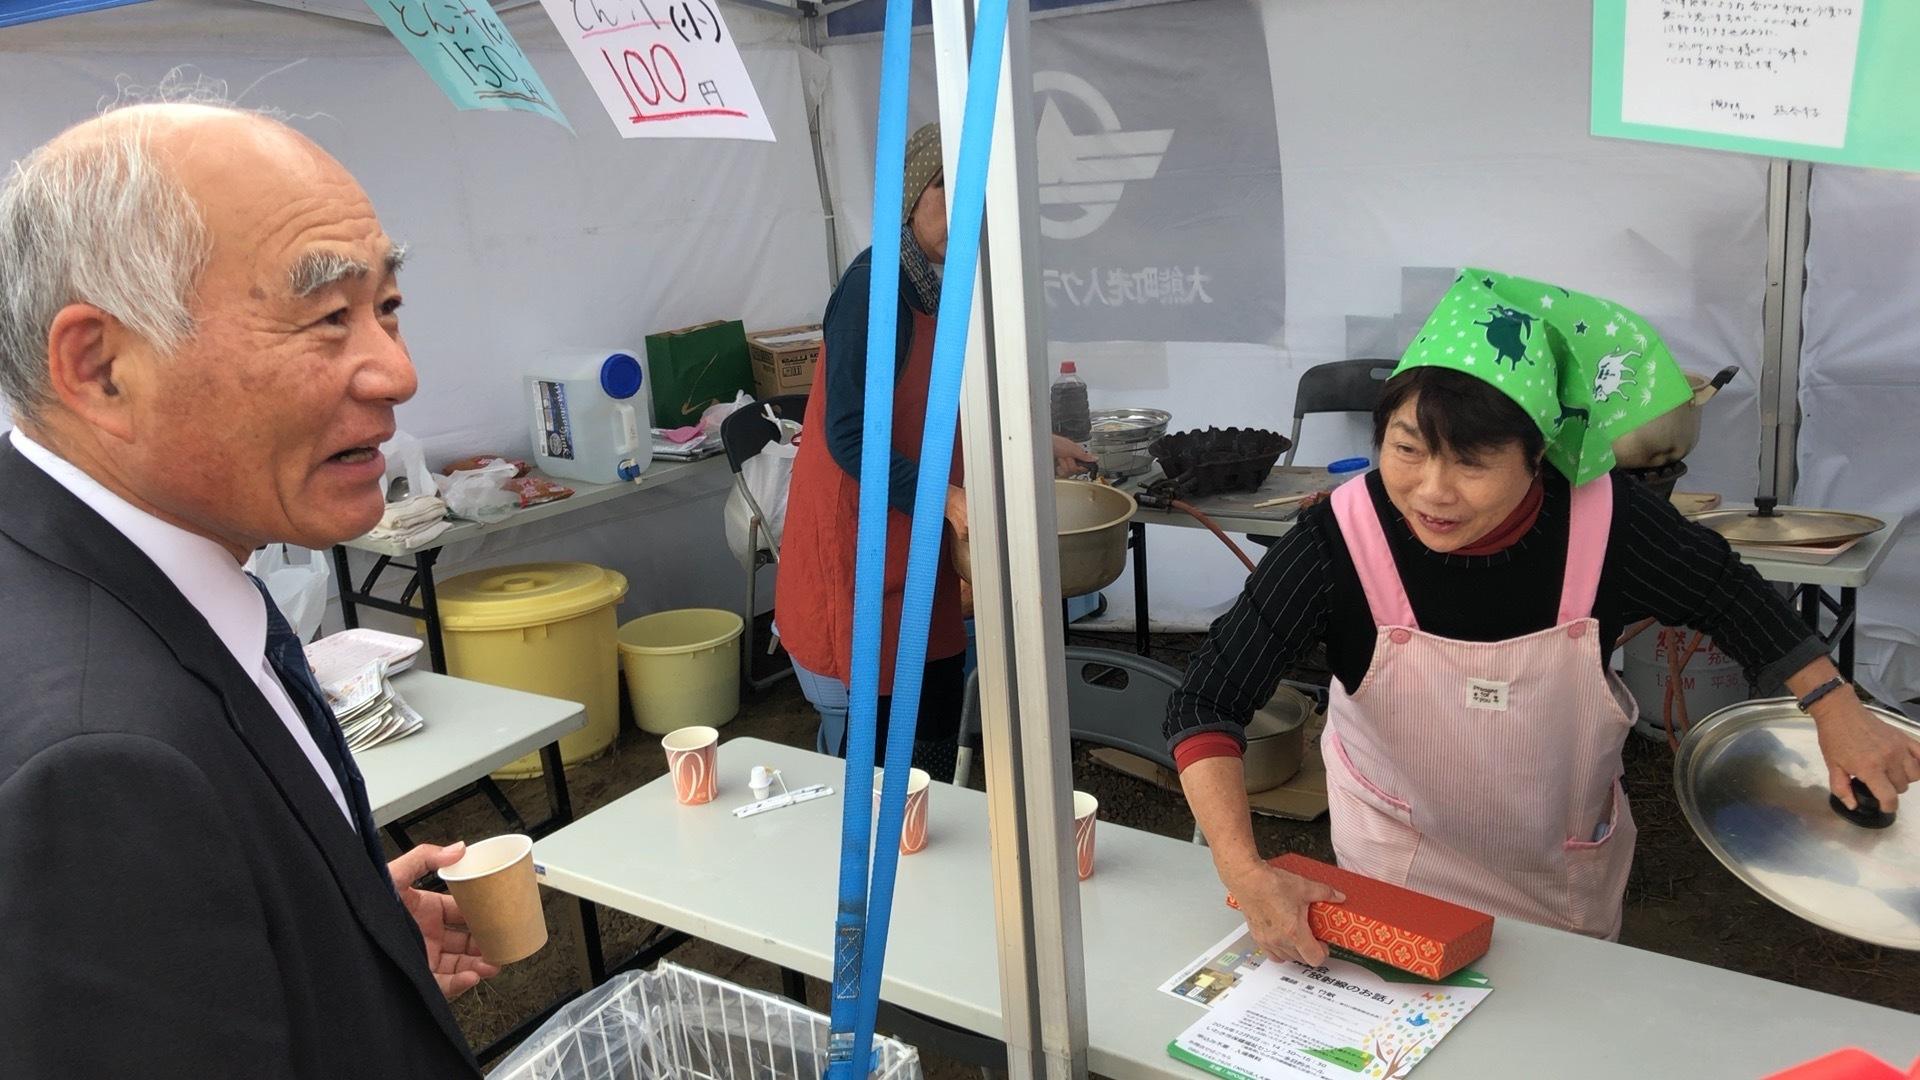 2018.11.10〜11 JAまつり、大熊町ふるさと祭りほか_a0255967_13504198.jpg